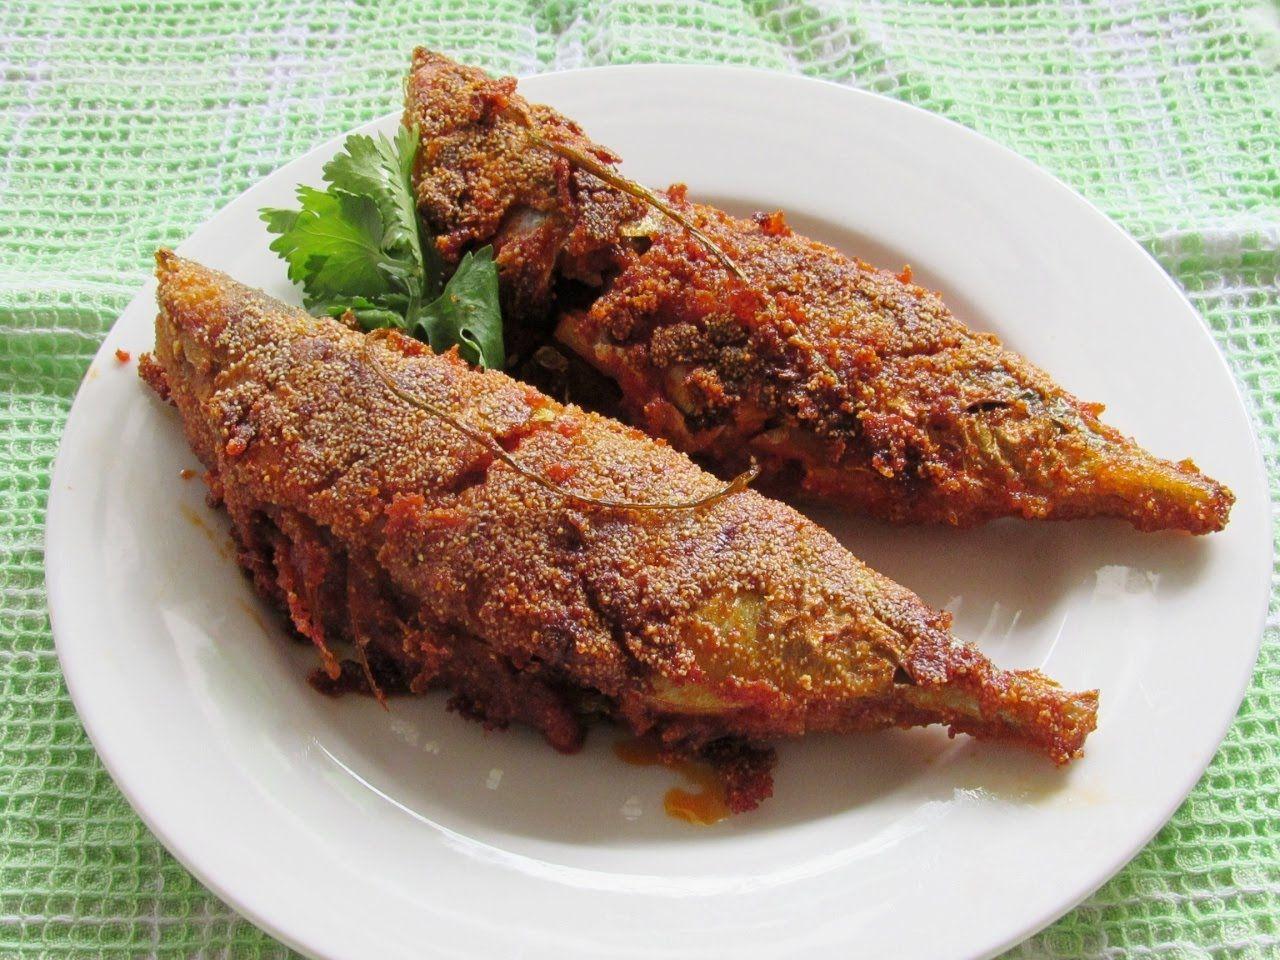 Rava Fish Fry Mangalore Style Fish Fry Bangade Bangada Fry Nisa Seafood Recipes Food Network Recipes Fish Fry Recipe Indian